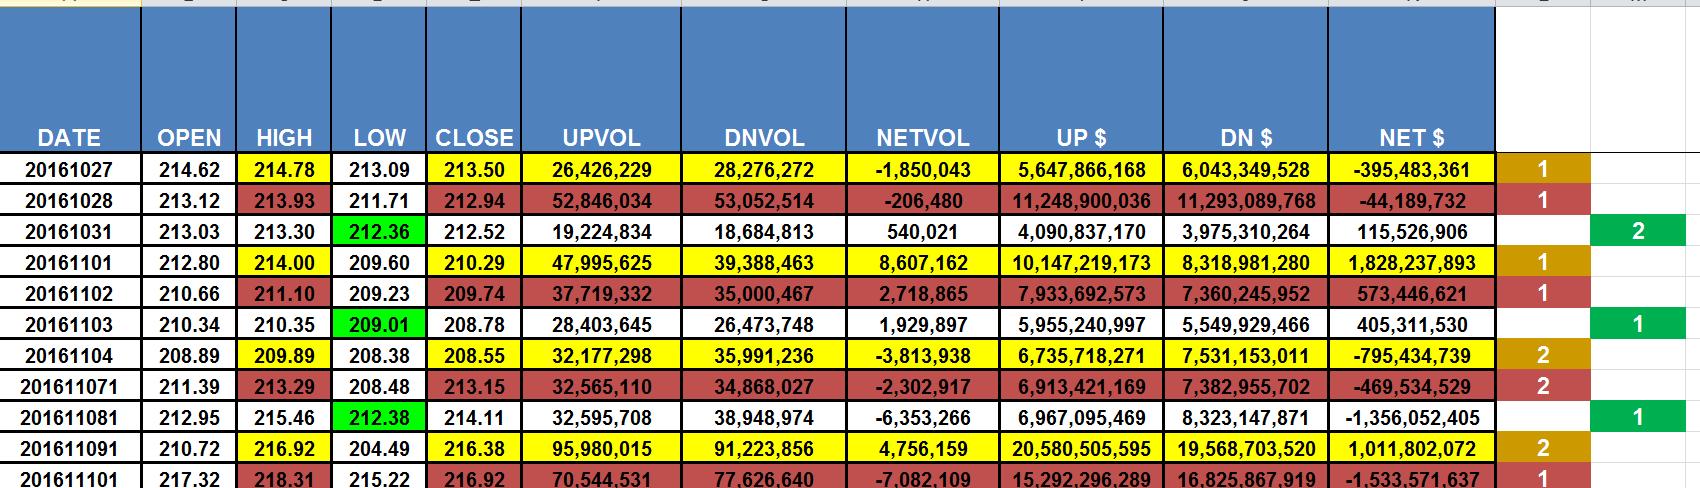 Sreen 1_Data Screen.PNG